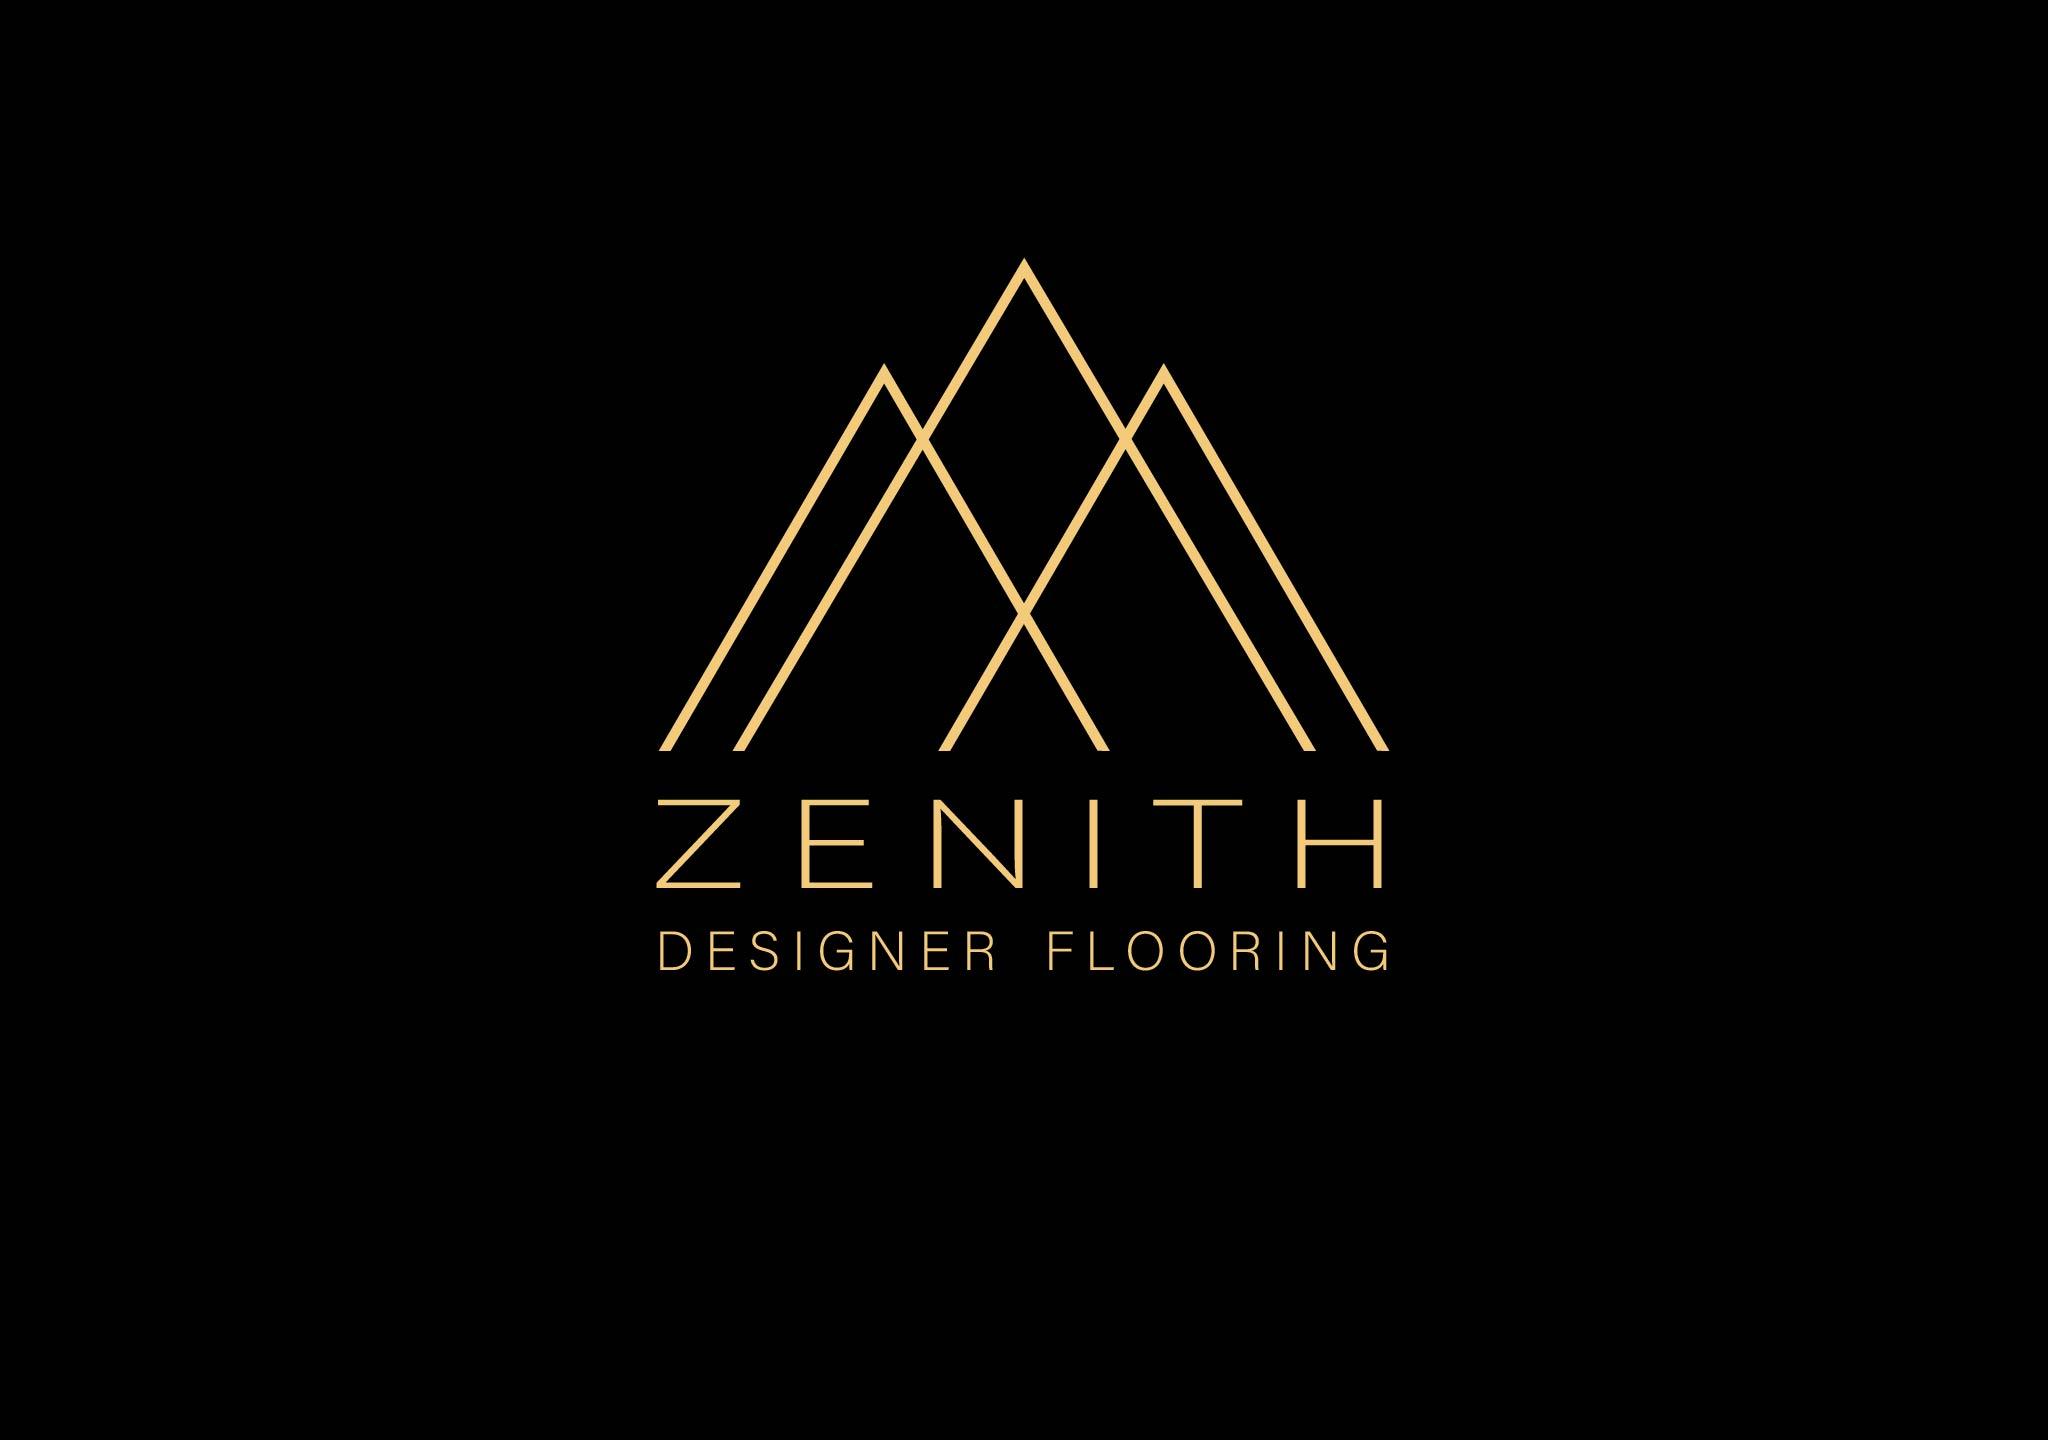 Zenith Designer Flooring